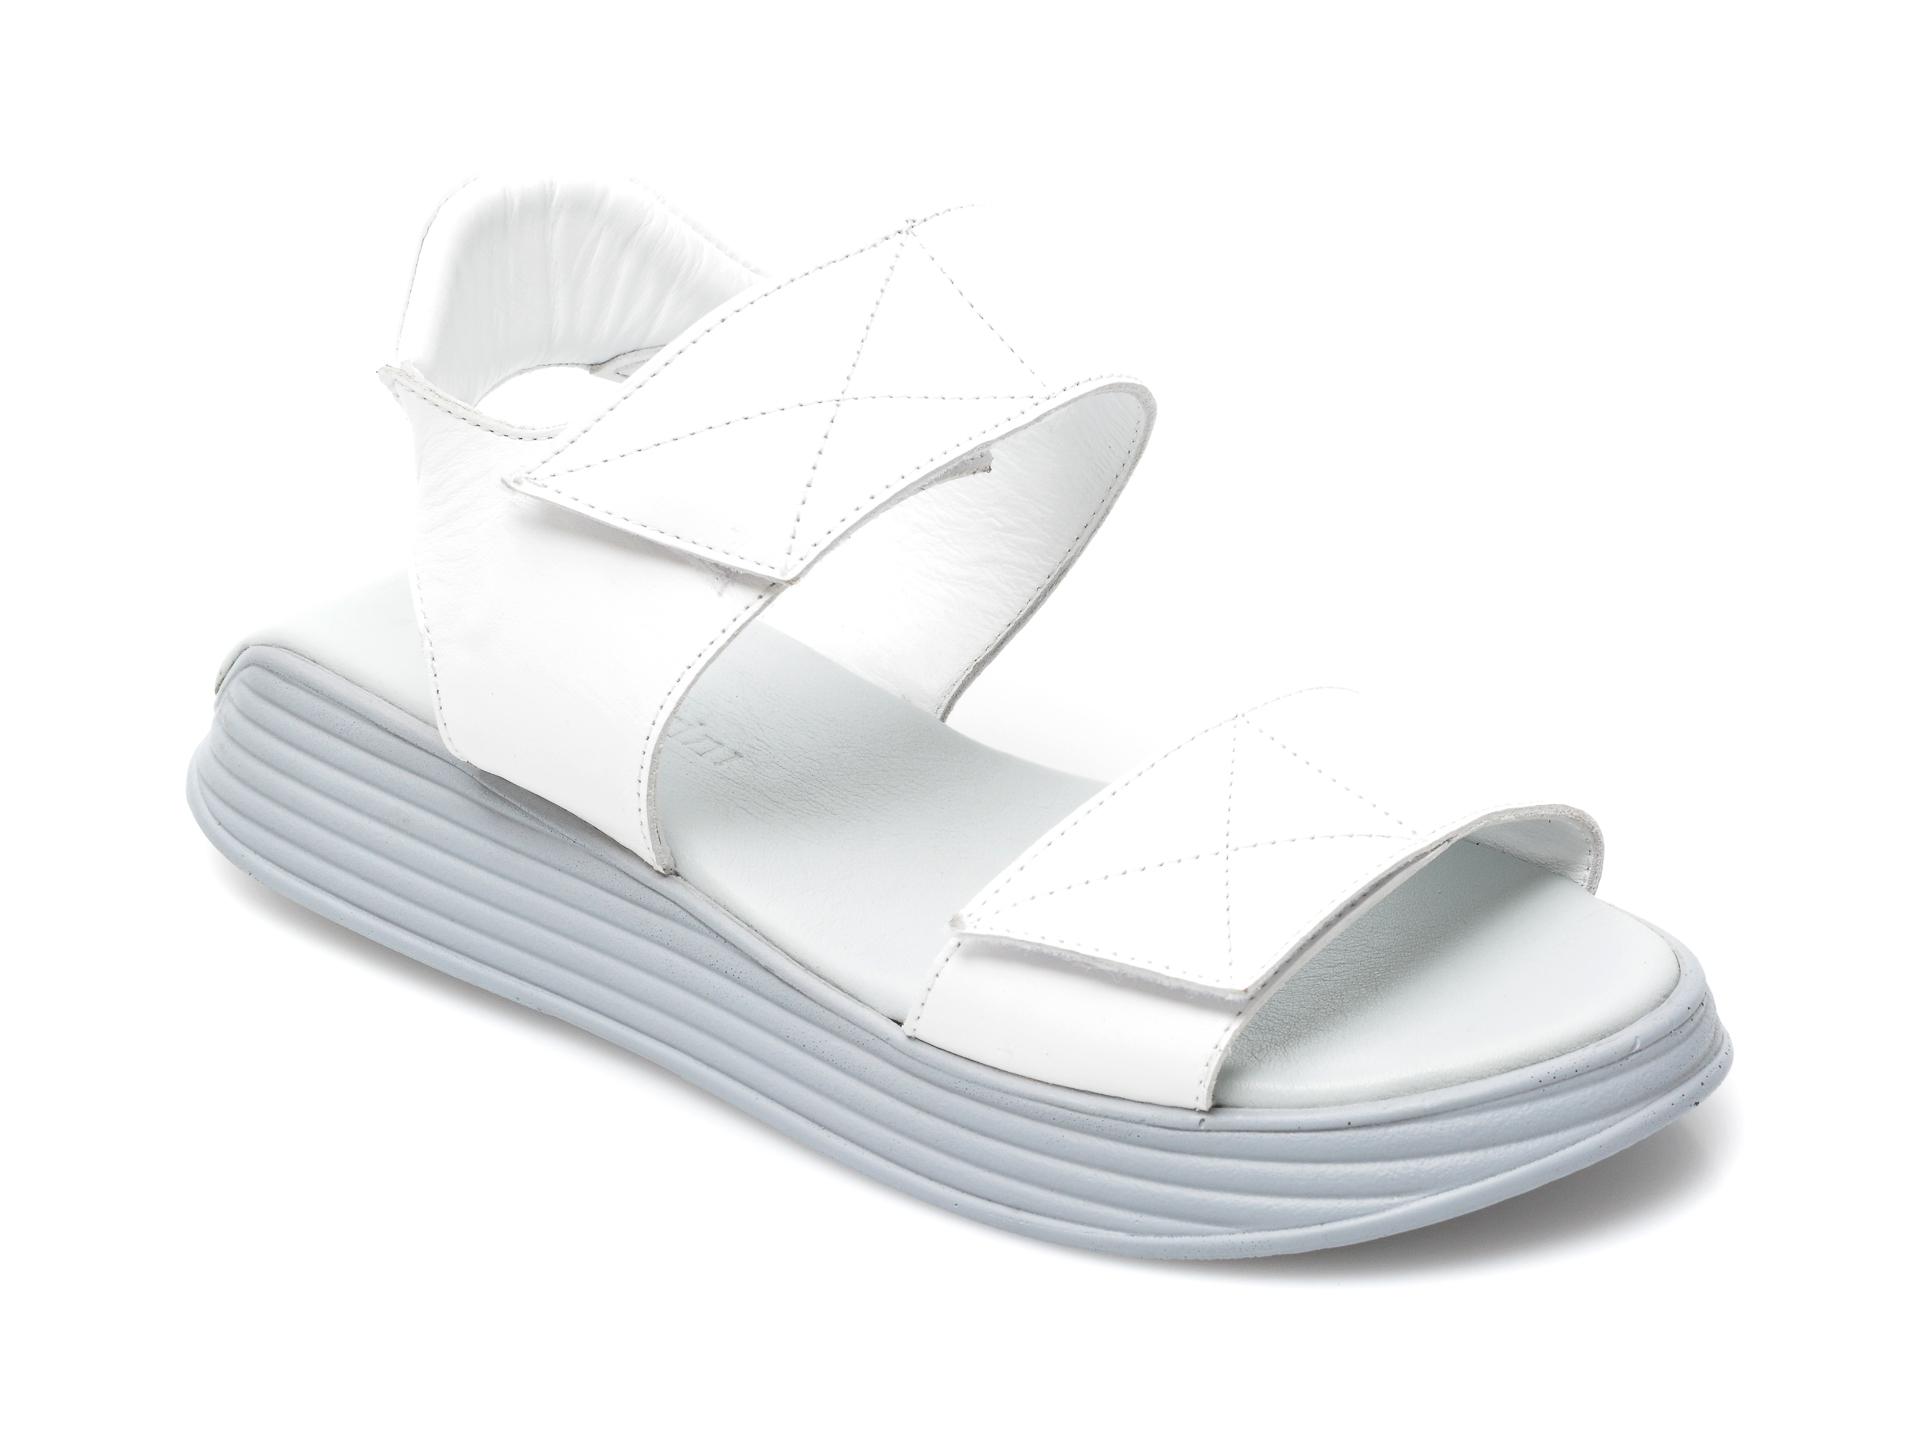 Sandale FLAVIA PASSINI albe, 3879151, din piele naturala imagine otter.ro 2021